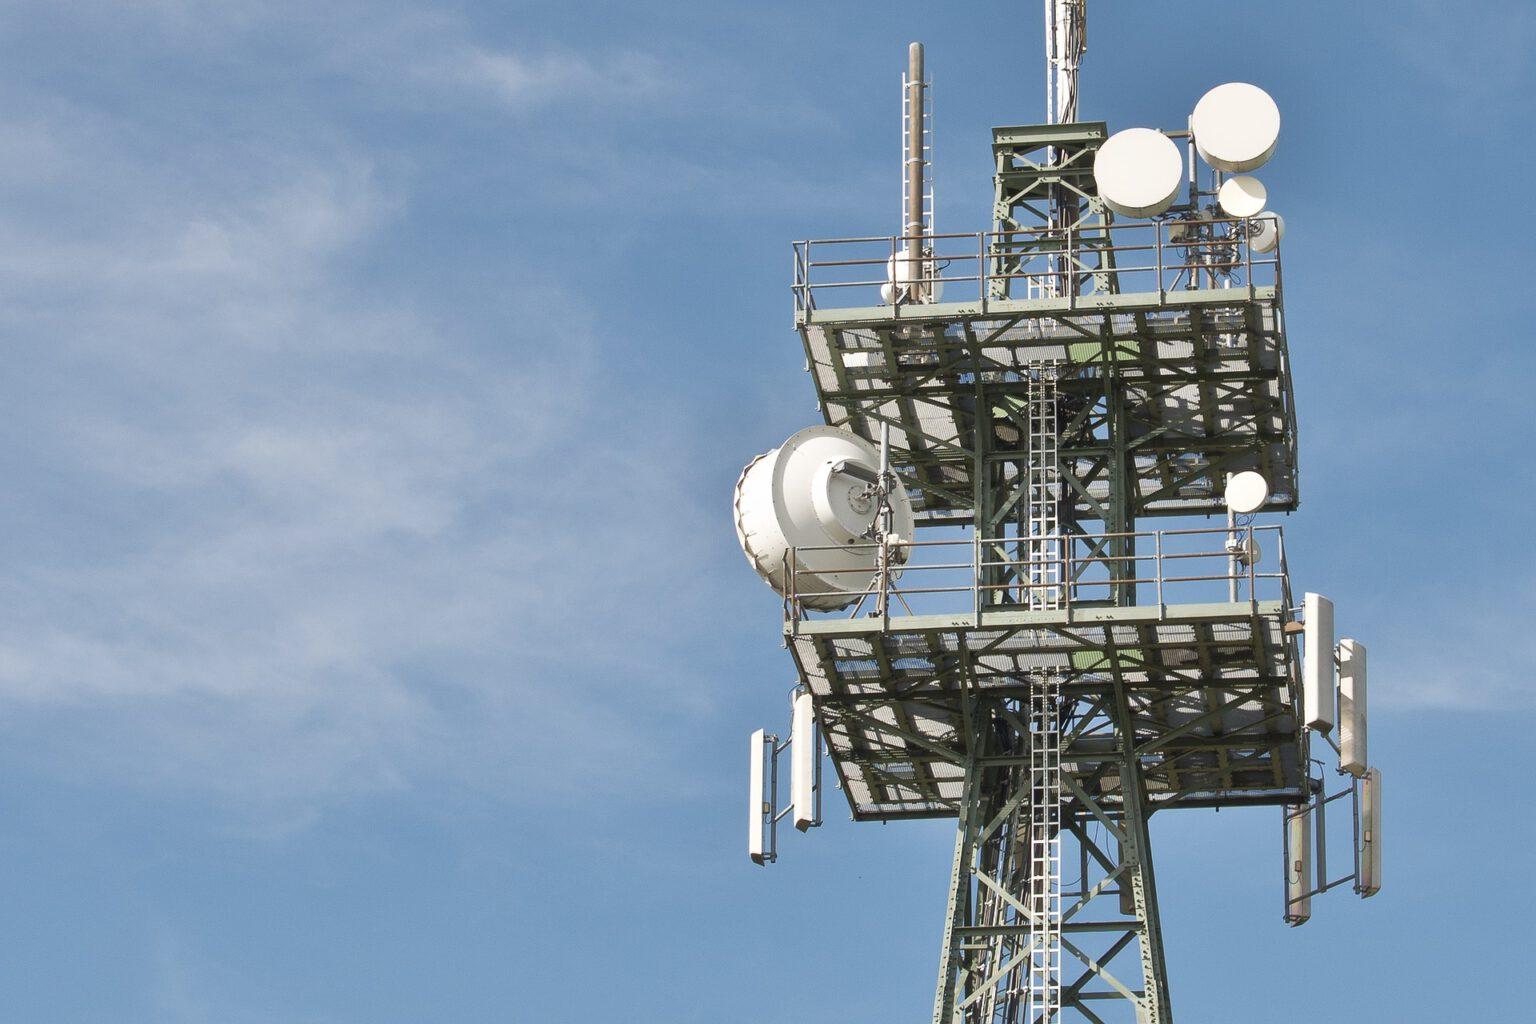 Ist das Mobilfunknetz bei Stromausfall gesichert?